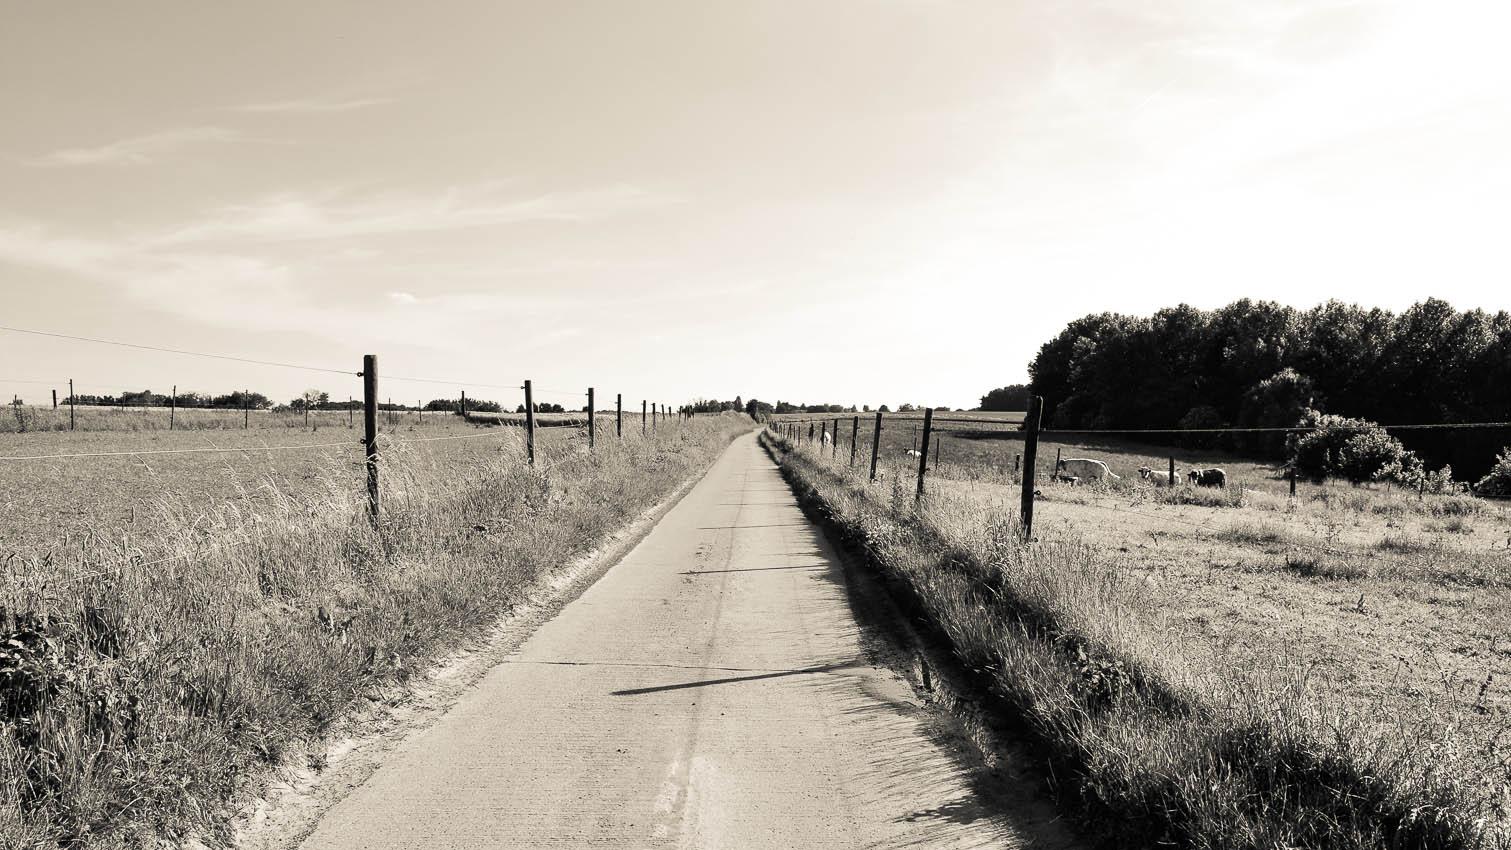 06-route-paysage-location-decors-film-cinema-photo-belgium-bruxelles